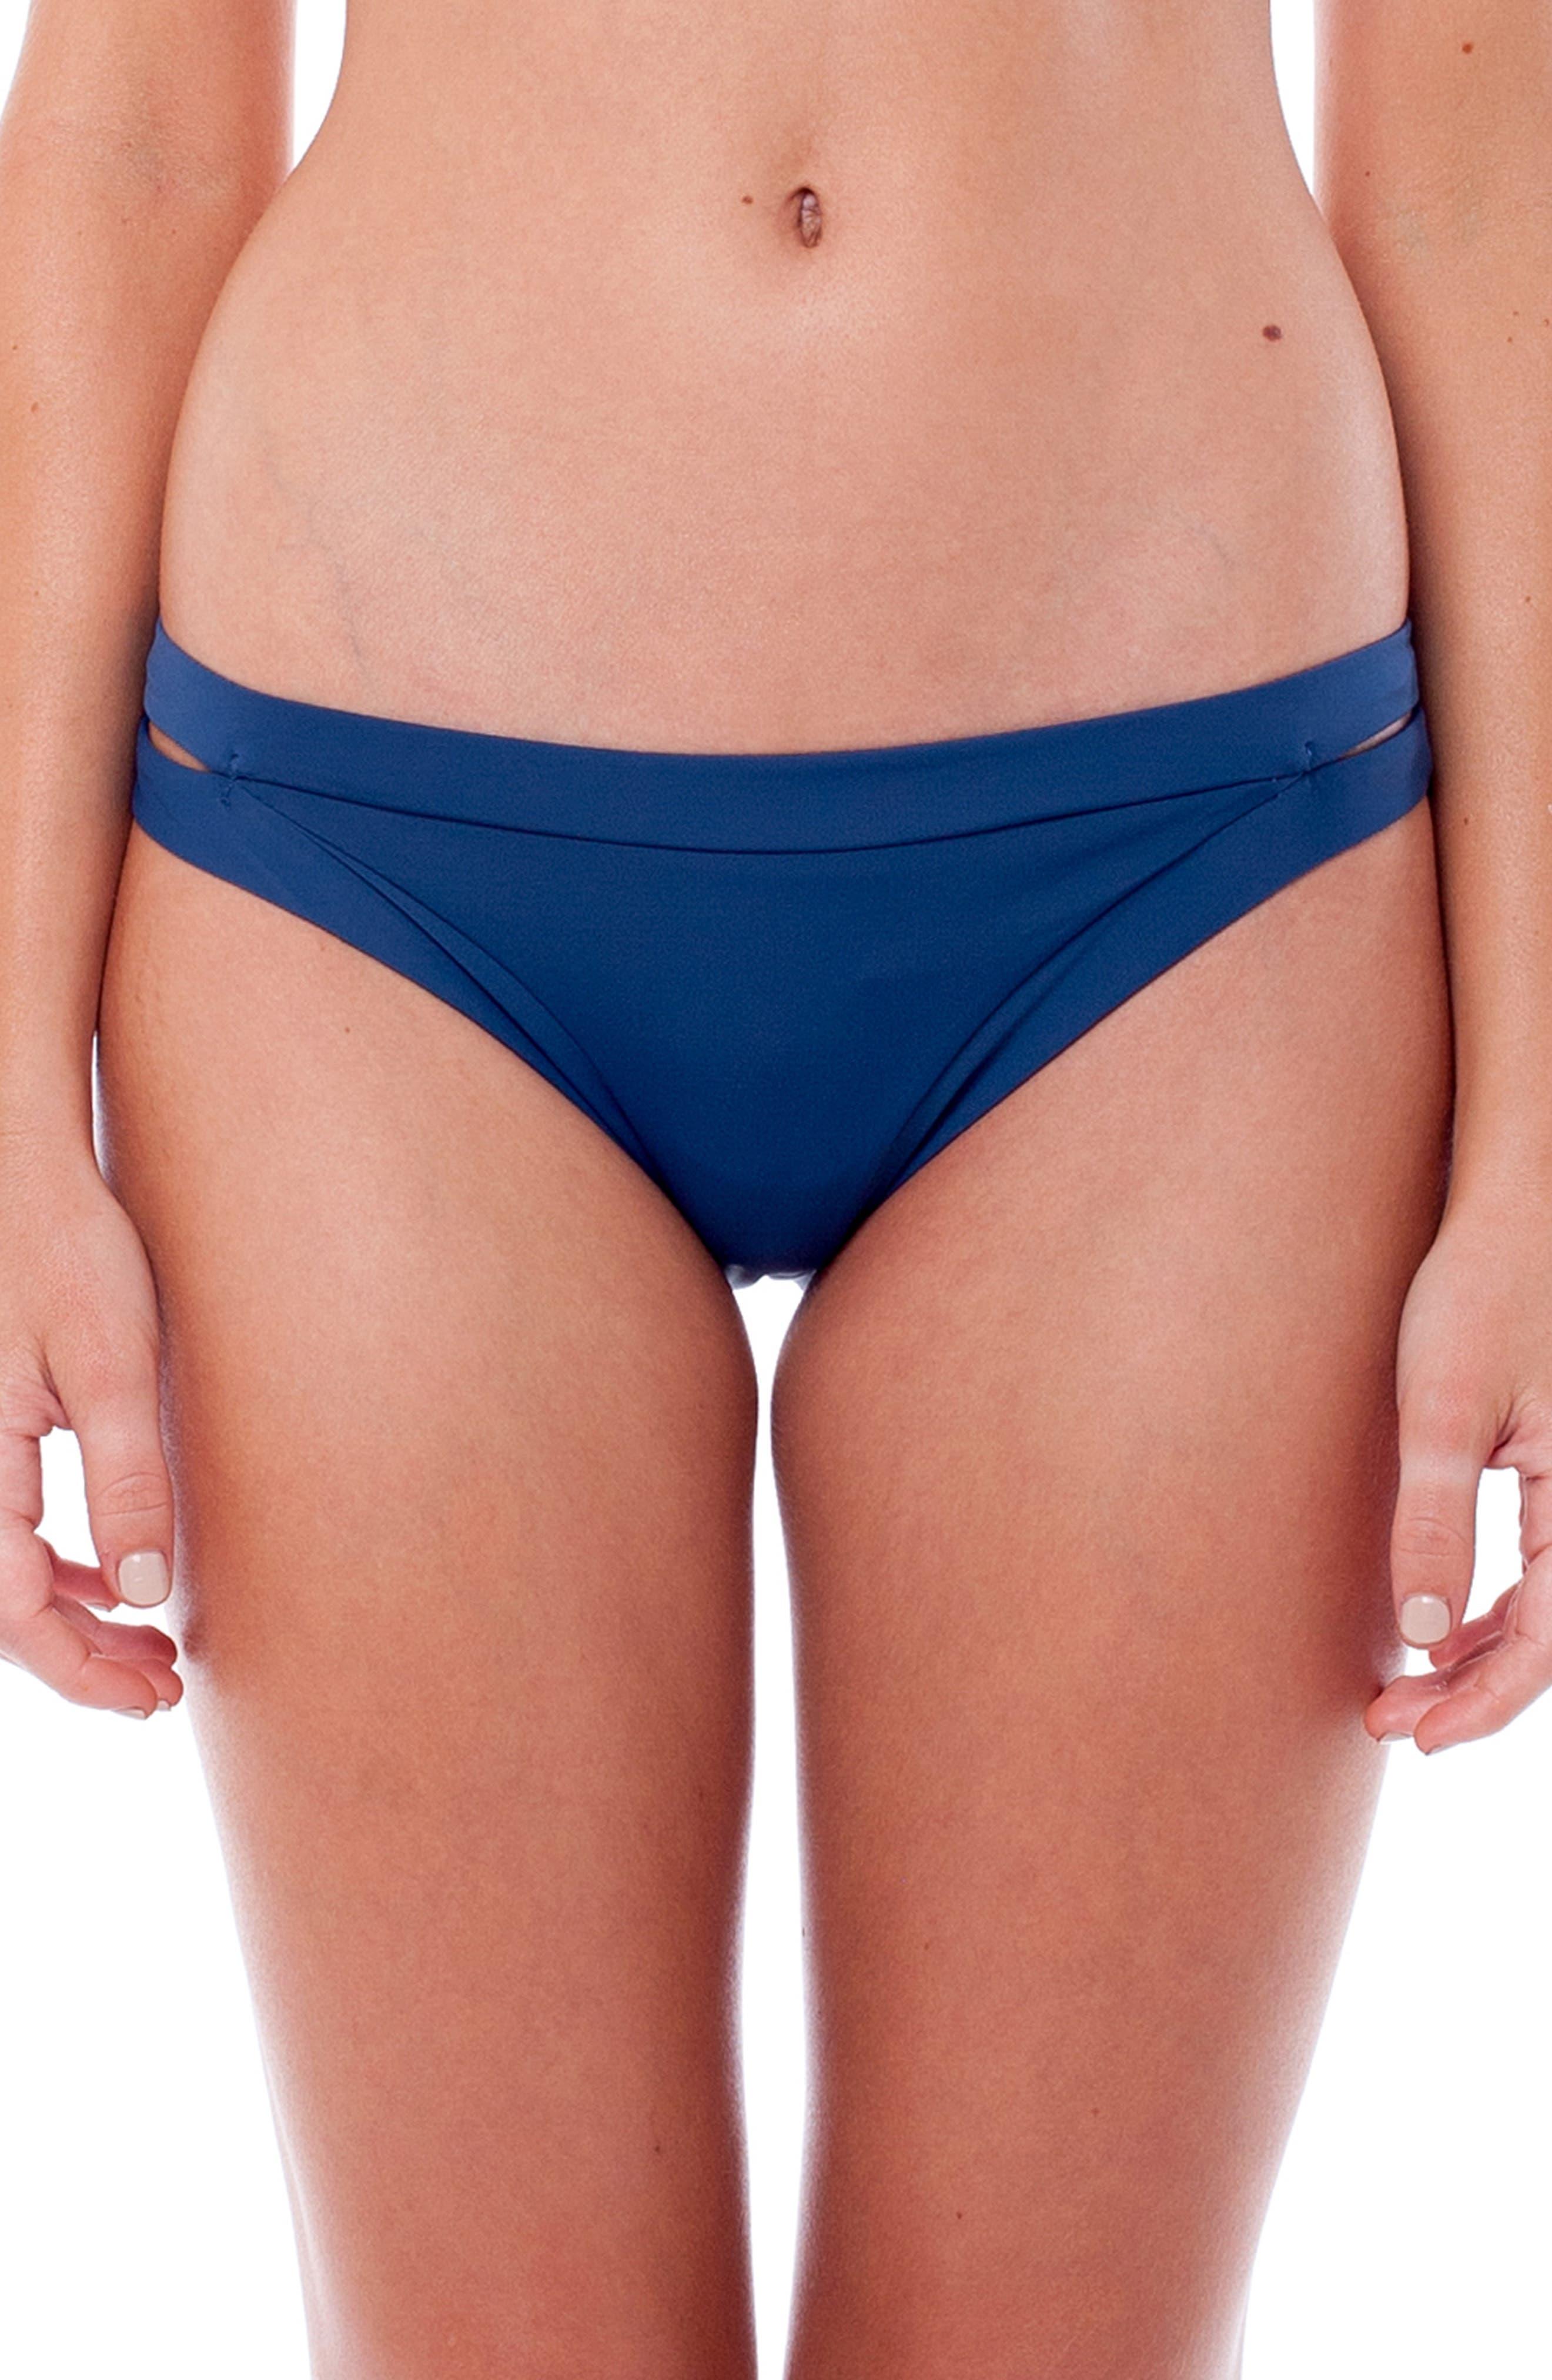 Sunchaser Bikini Bottoms,                             Main thumbnail 1, color,                             NAVY